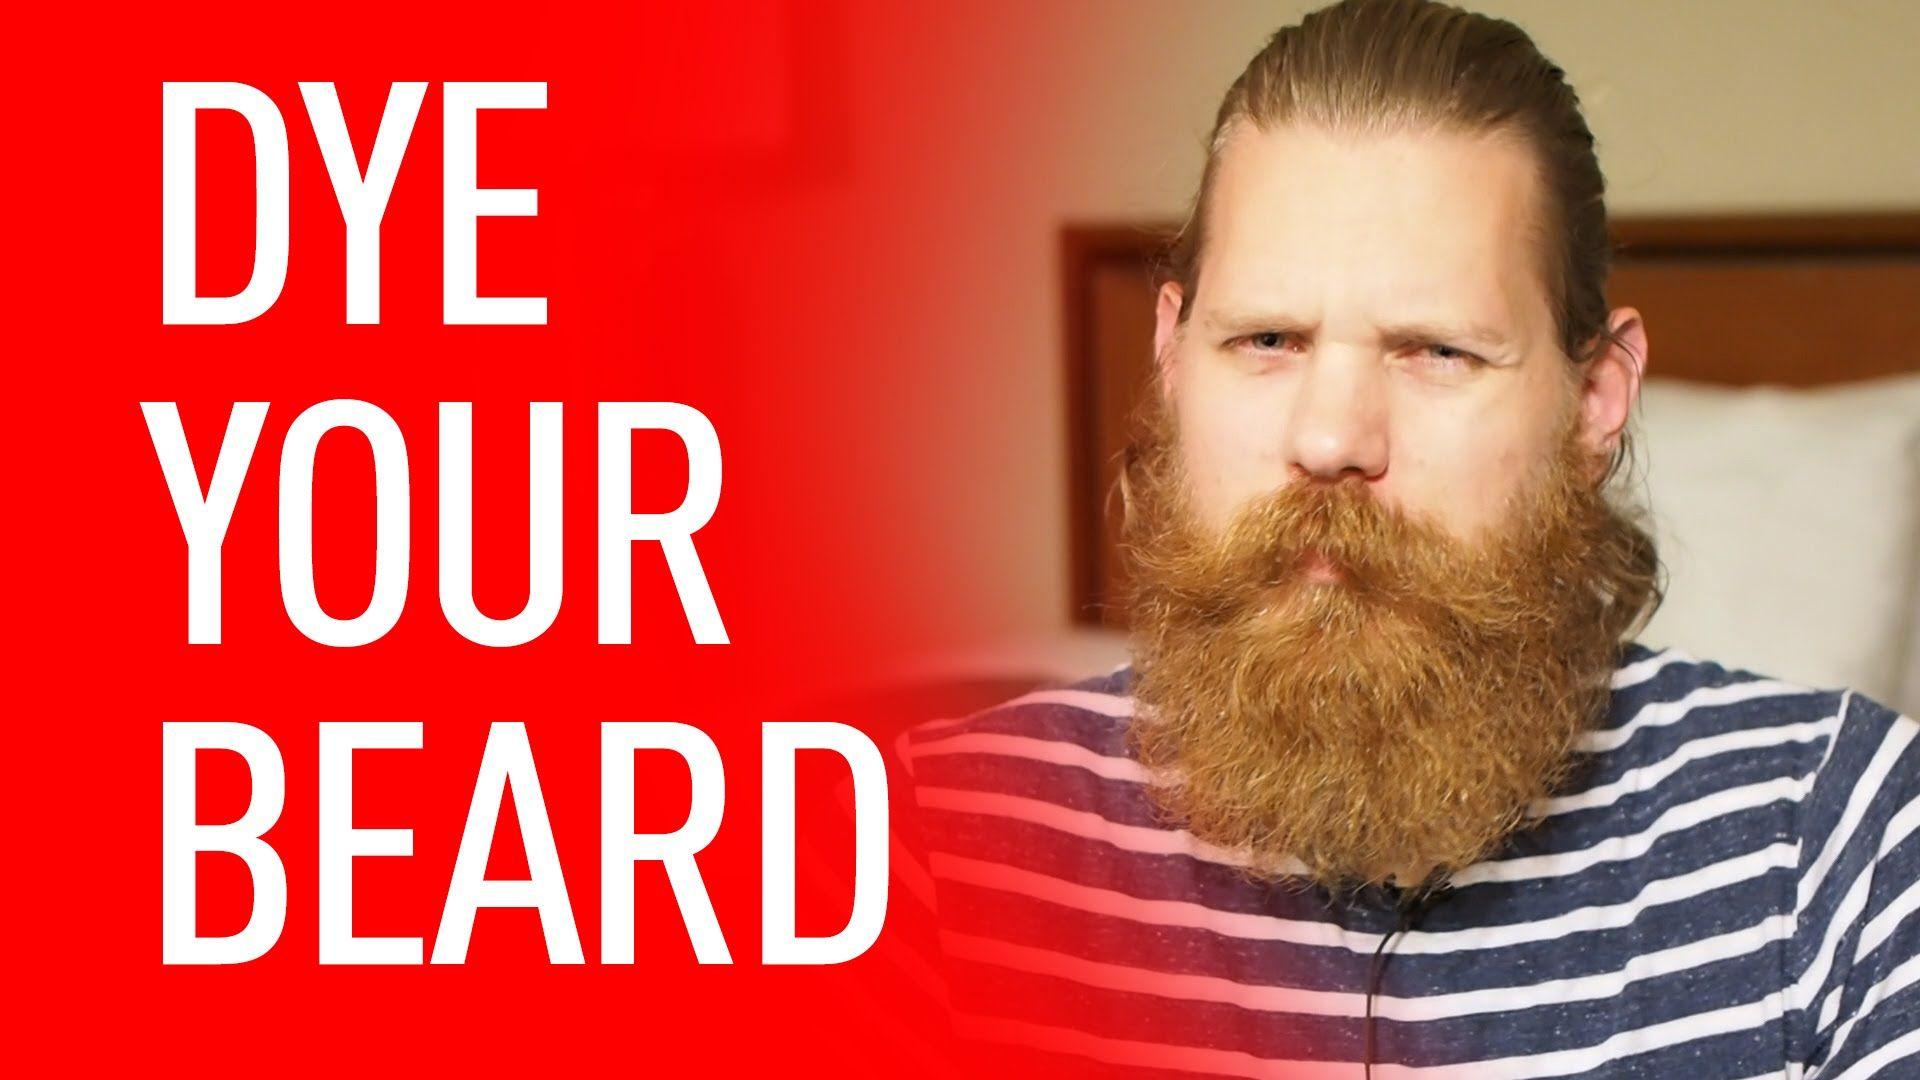 Dye Your Beard | Beardbrand | Beardbrand Channel | Diy hairstyles ...